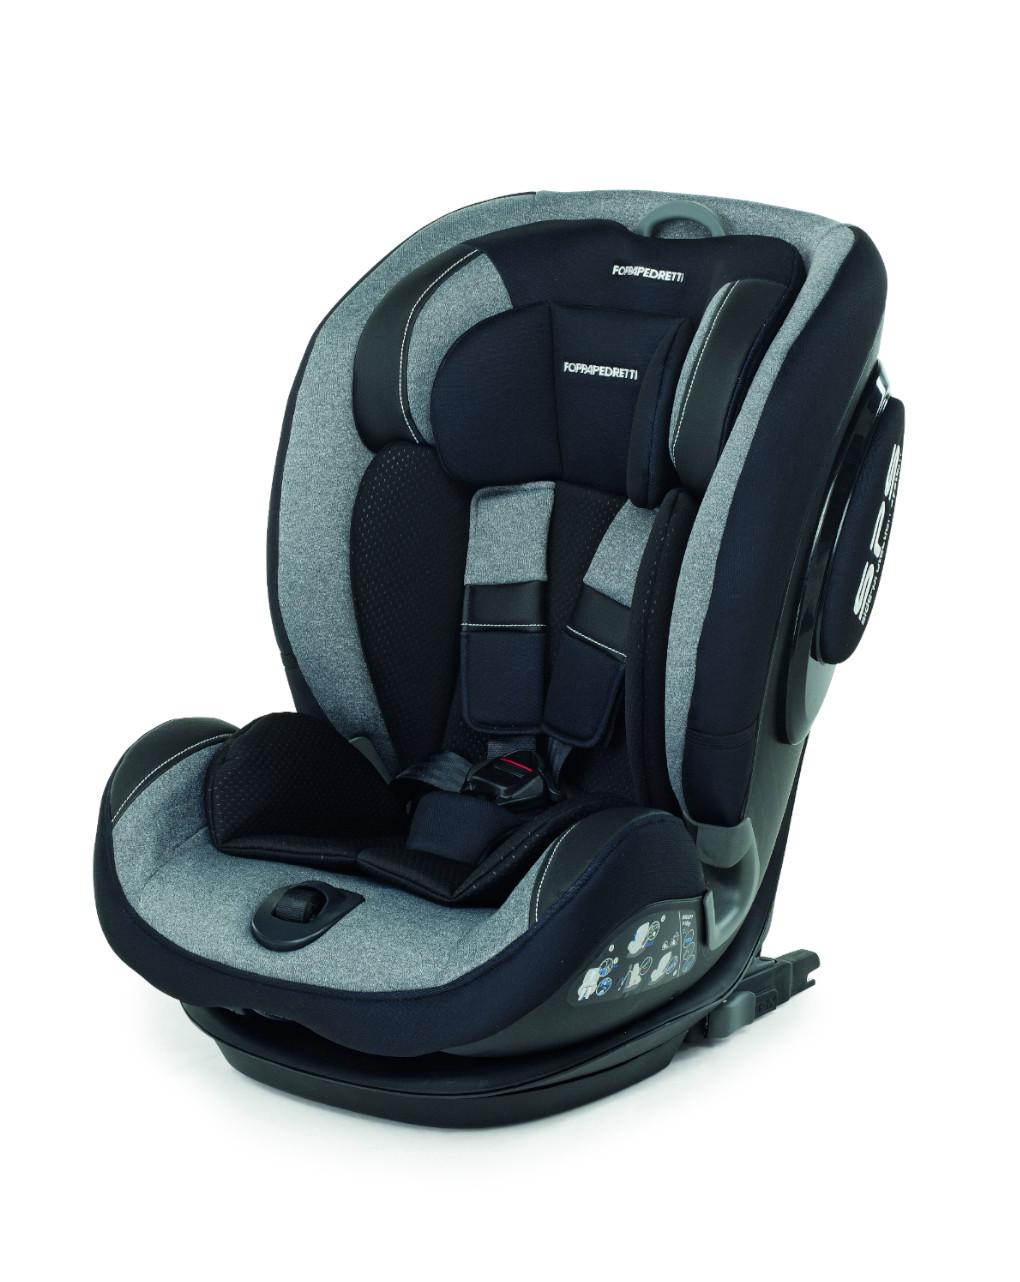 Cadeira auto foppapedretti isoplus - carbono - Foppapedretti